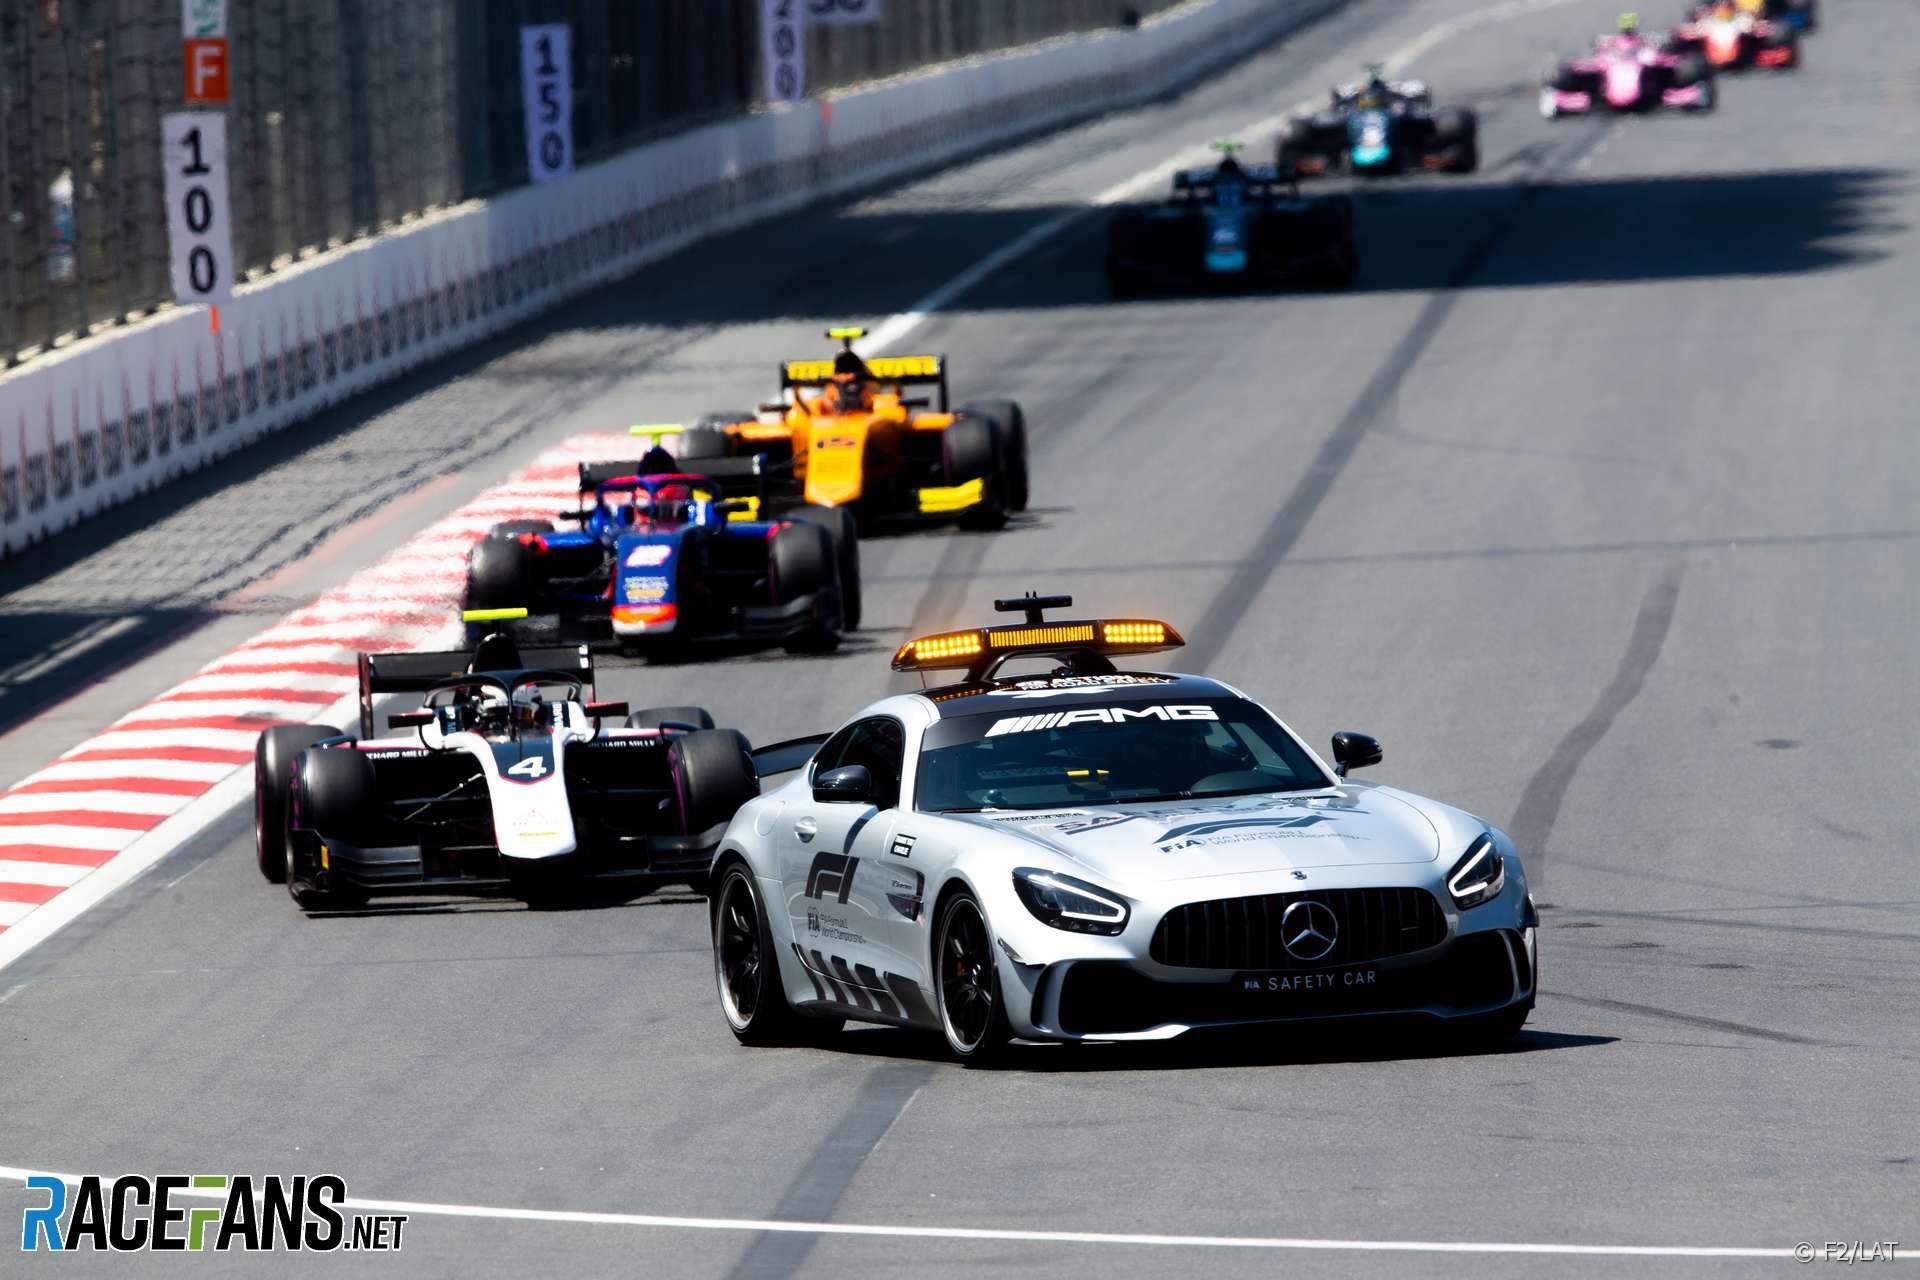 Safety Car, Baku, Formula Two, 2019